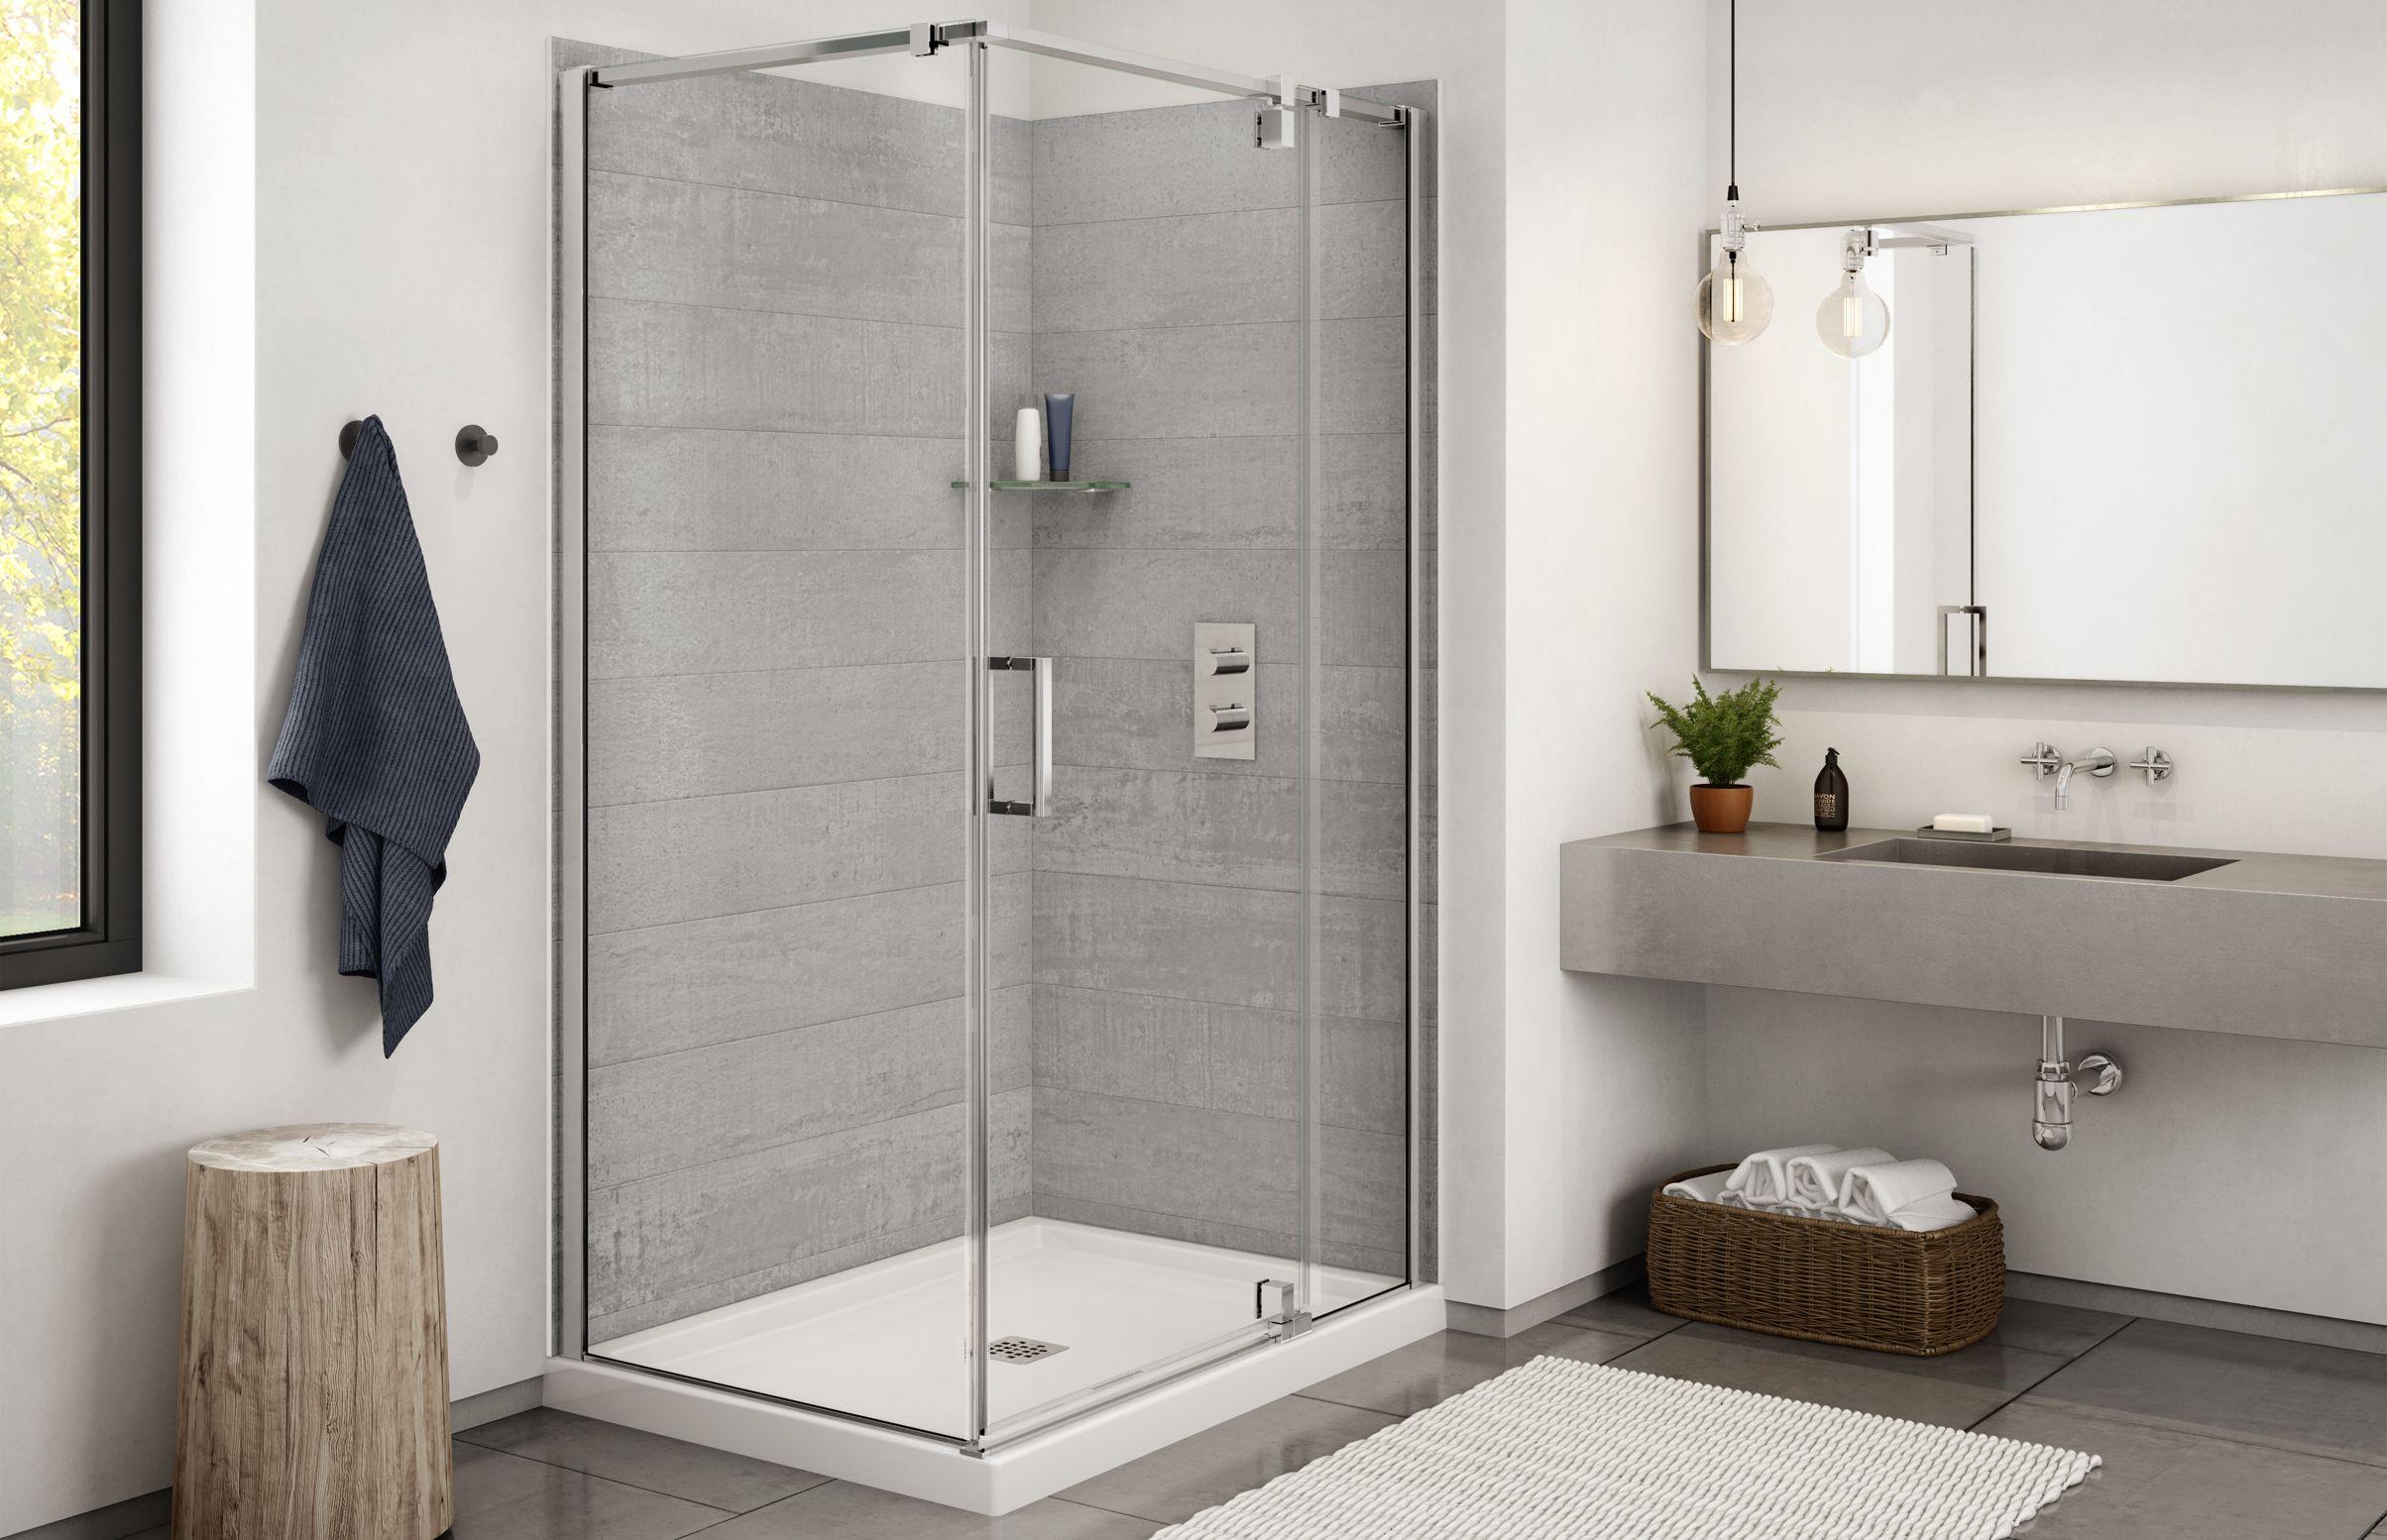 Utile back wall 60 in in 2018 | Master bath | Pinterest | Shower ...